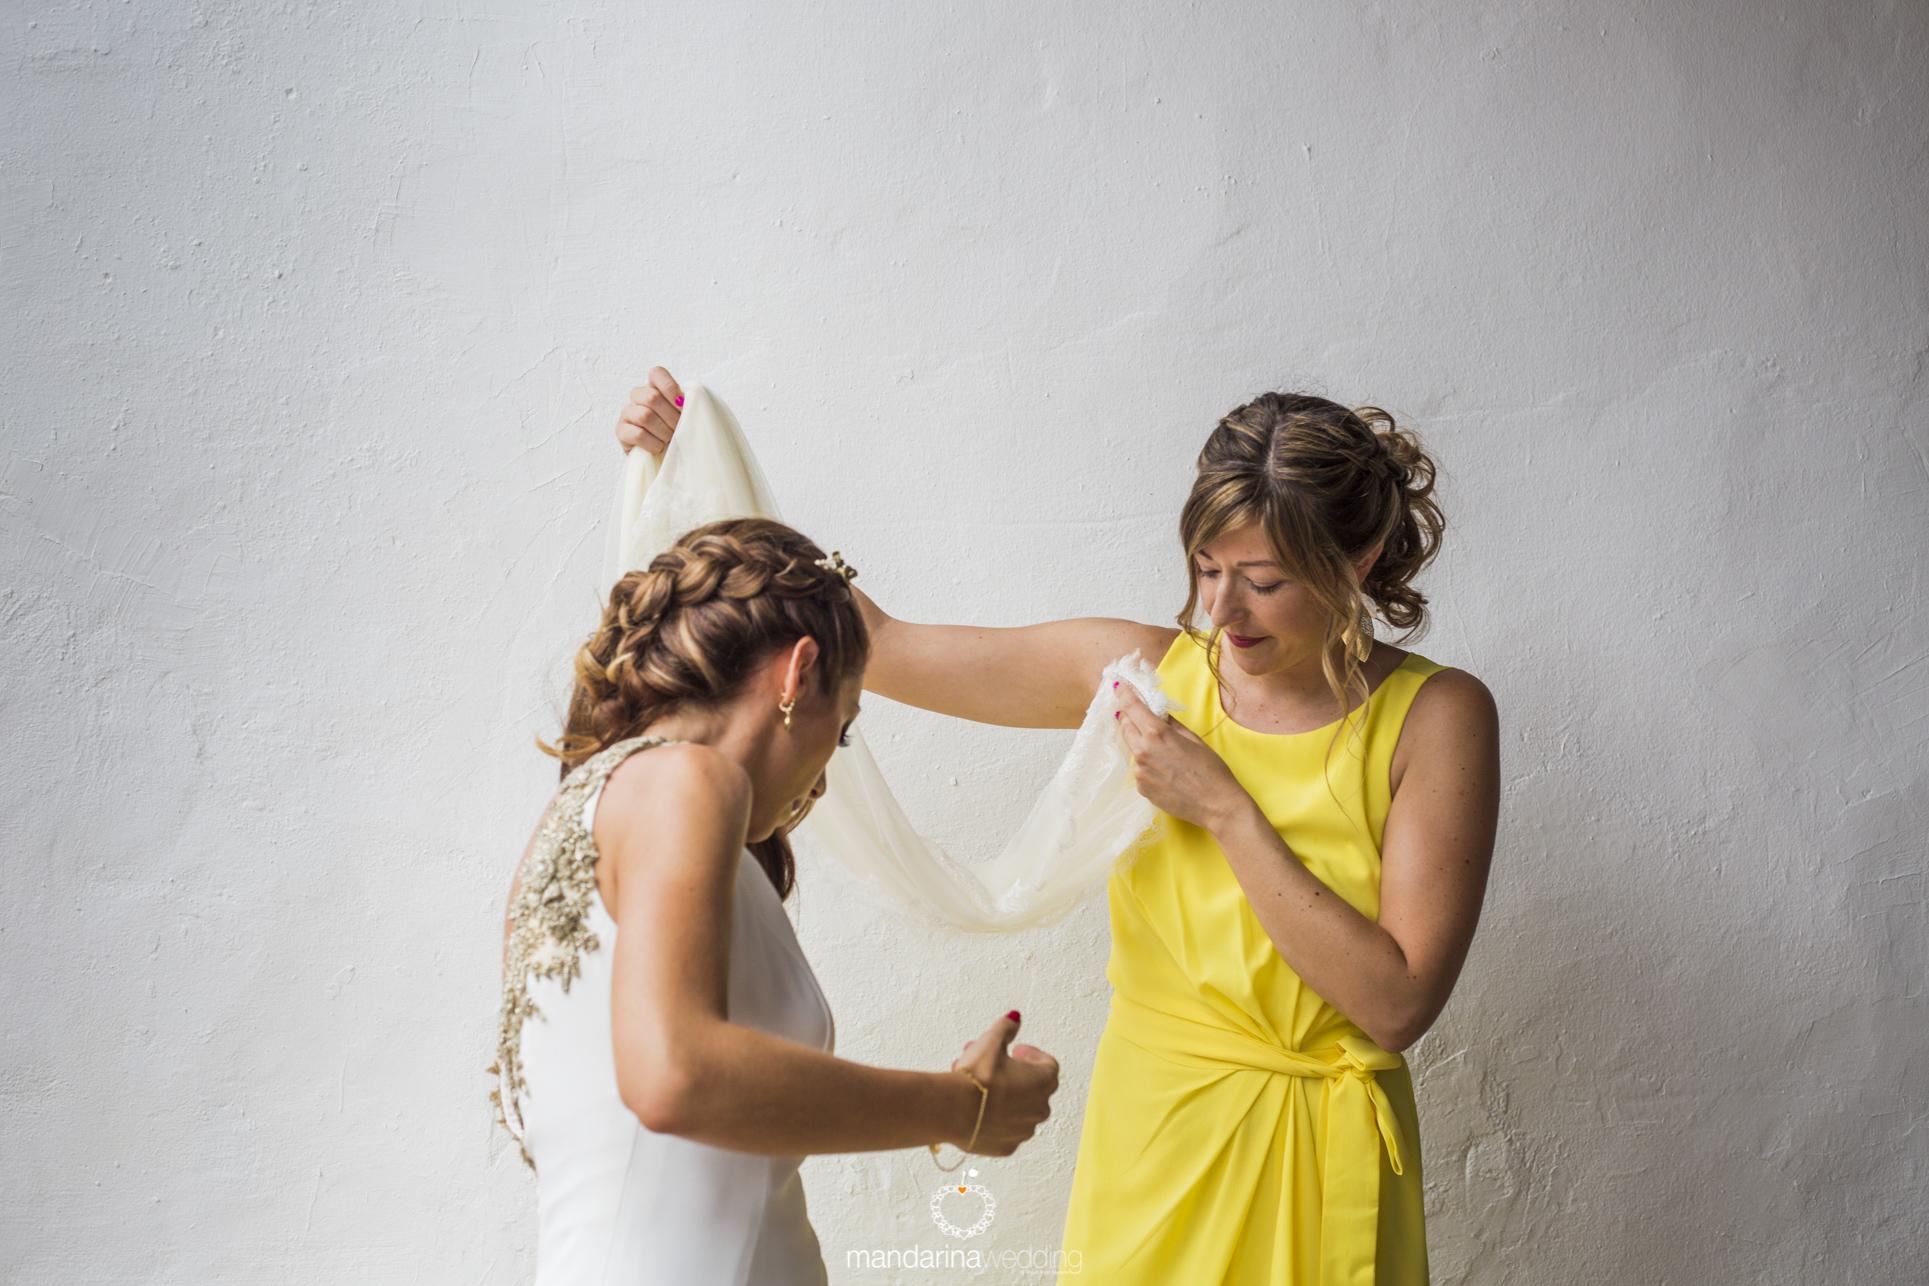 mandarina wedding, fotografo boda pais vasco, fotografo boda zaragoza, fotógrafo boda soria, fotografo boda Madrid, fotógrafo boda tarragona-33